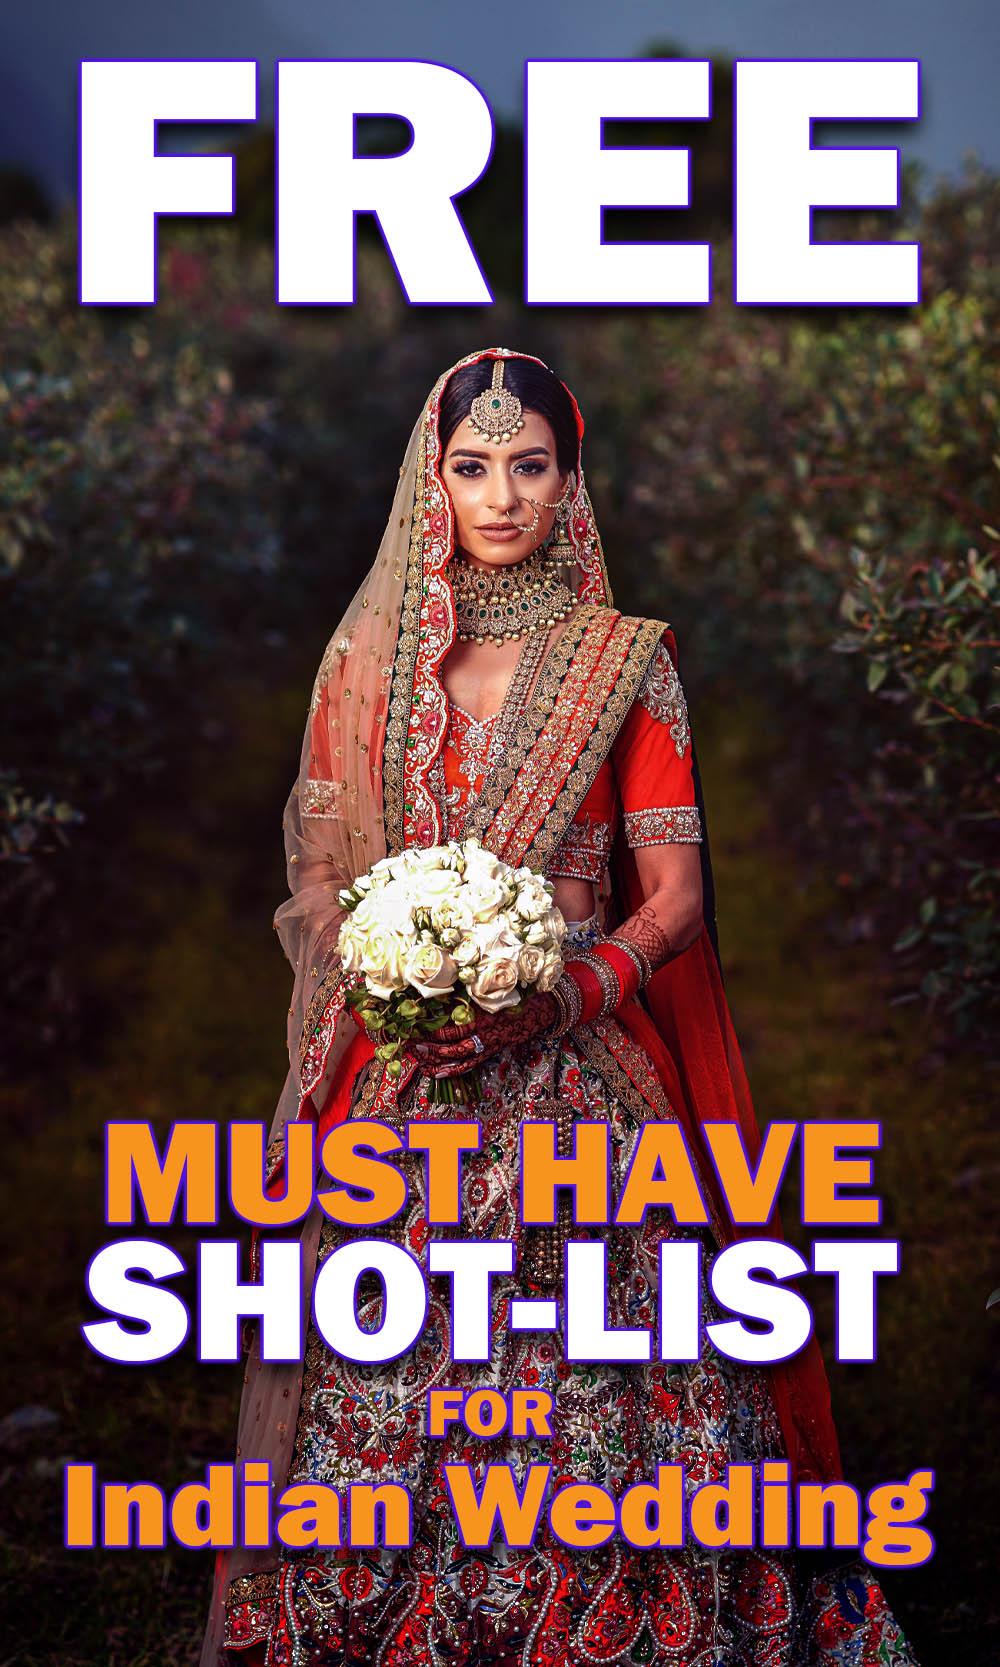 Free Shotlist for Indian Weddings